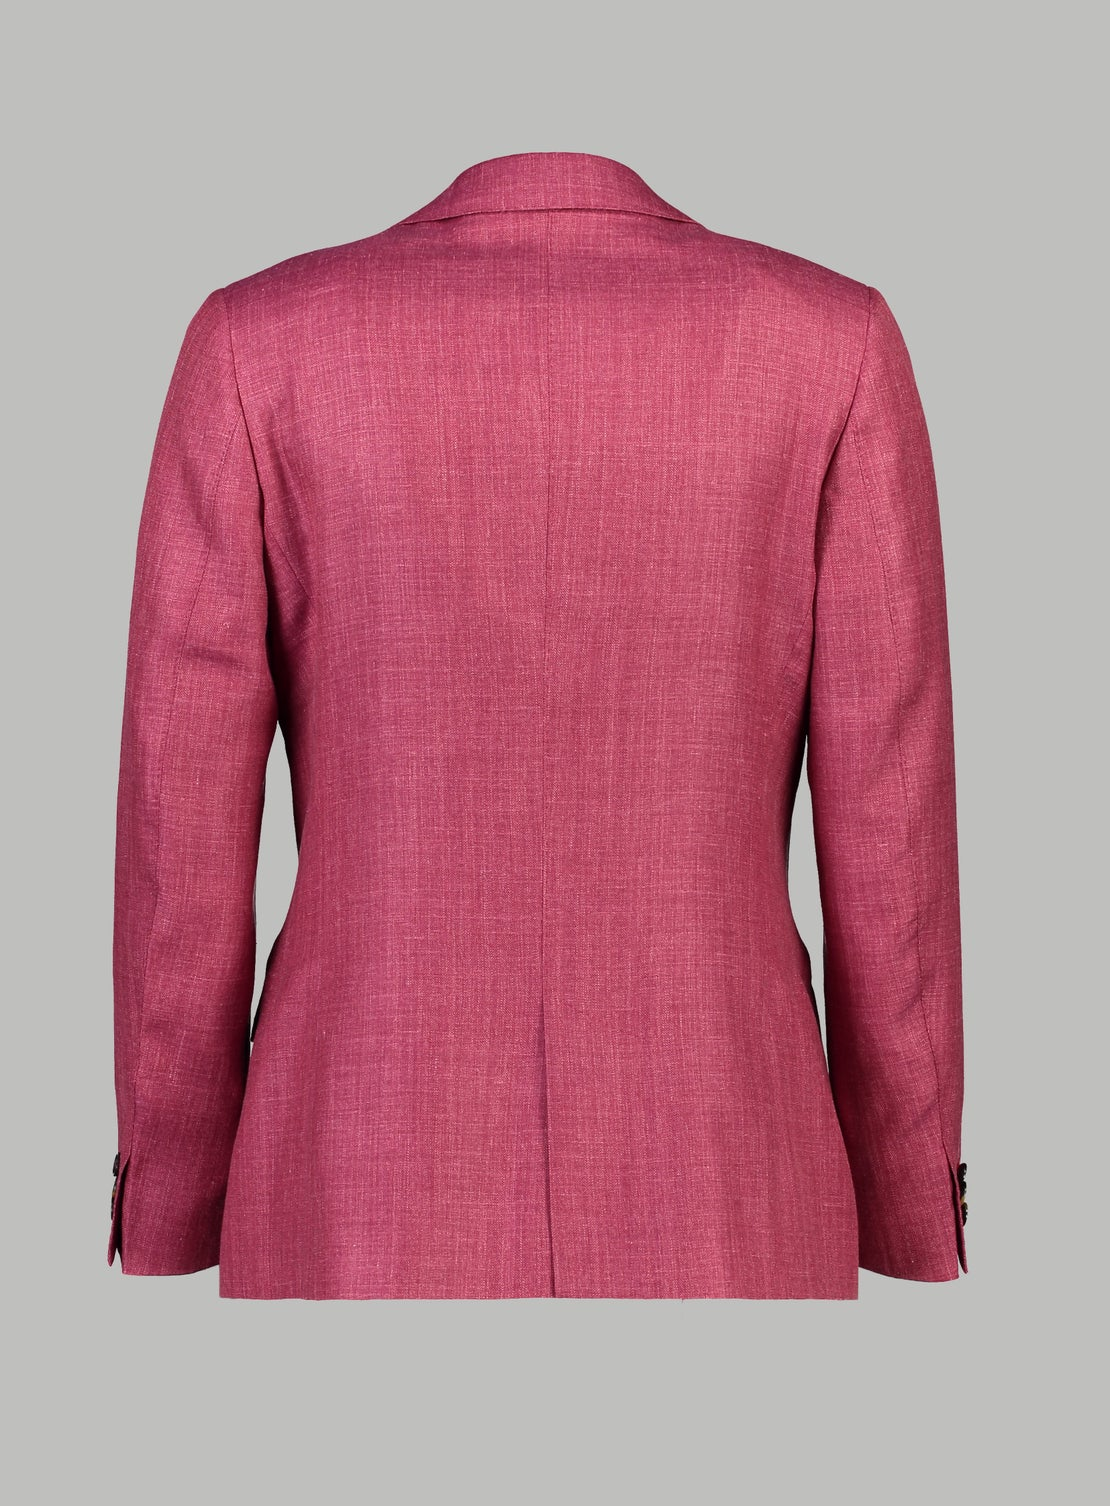 Fuscia Luxe Jacket